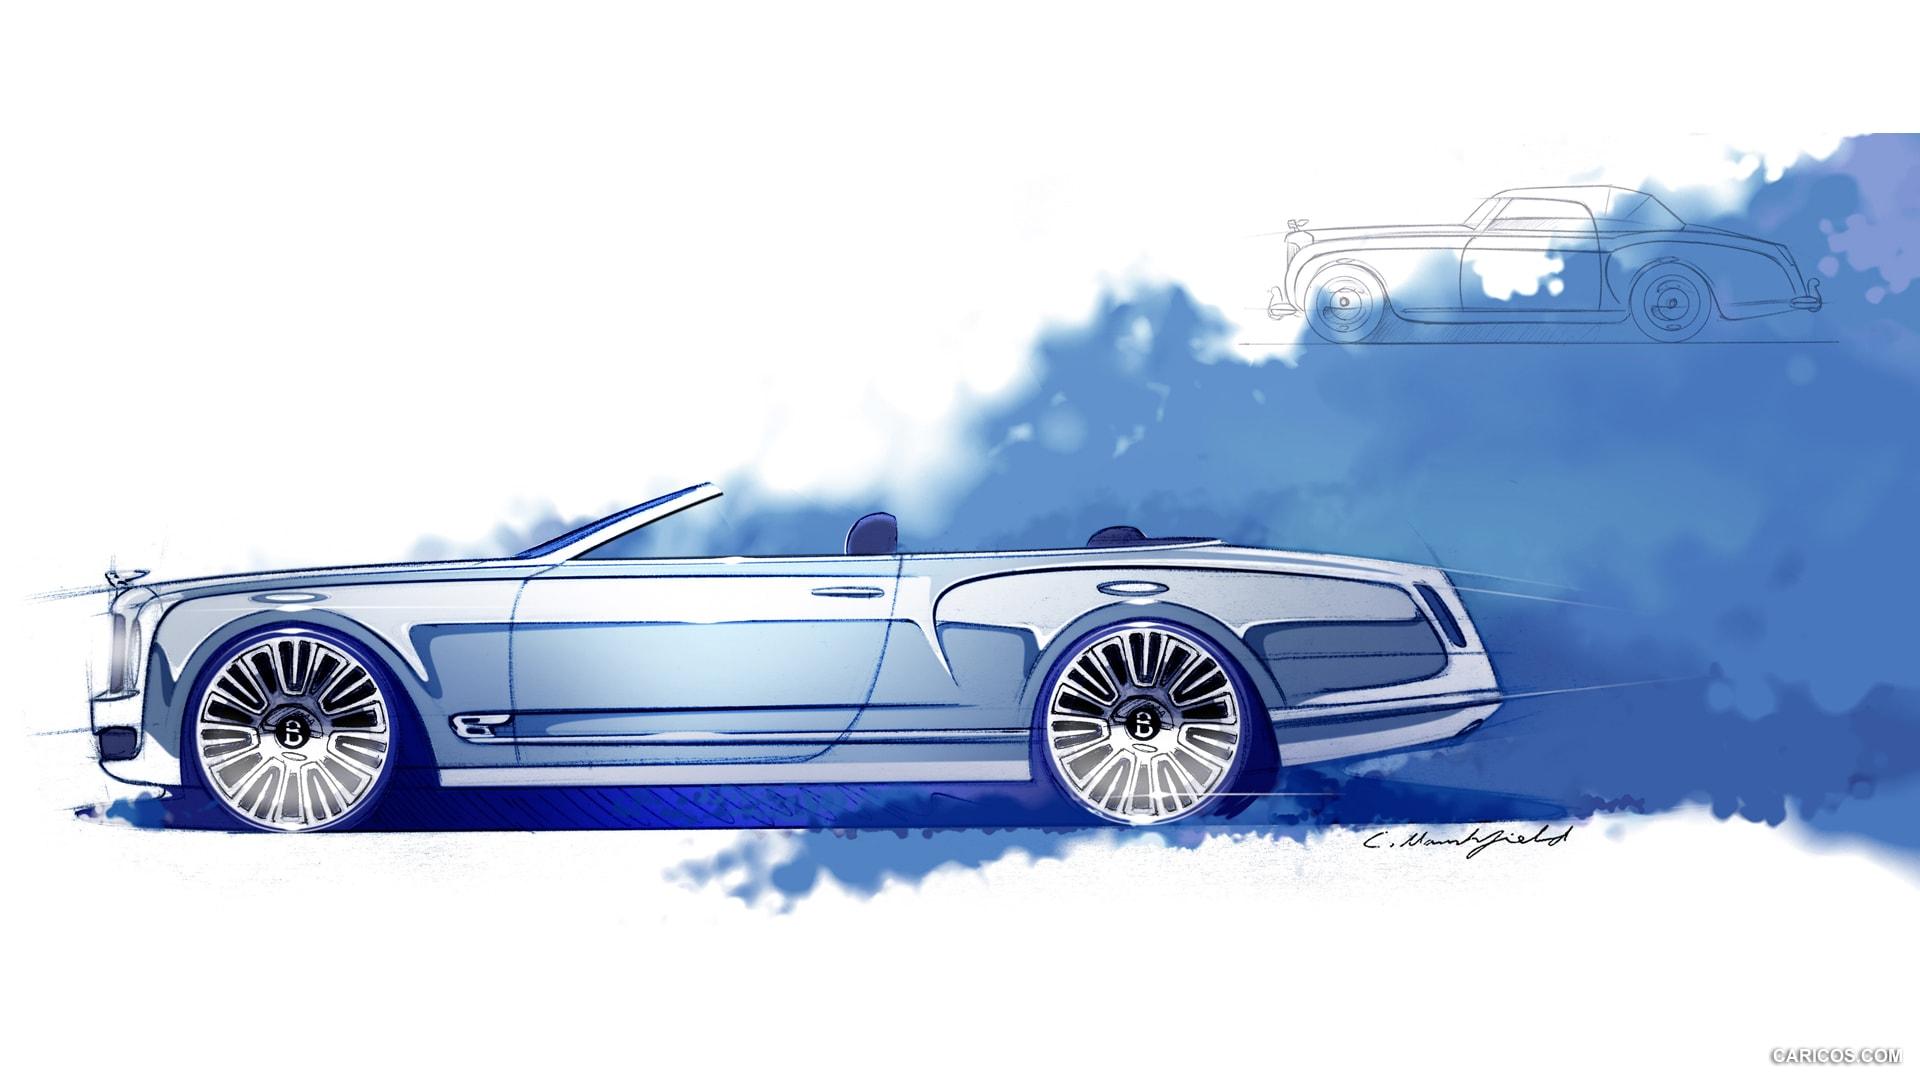 2012_bentley_mulsanne_convertible_concept_1_1920x1080